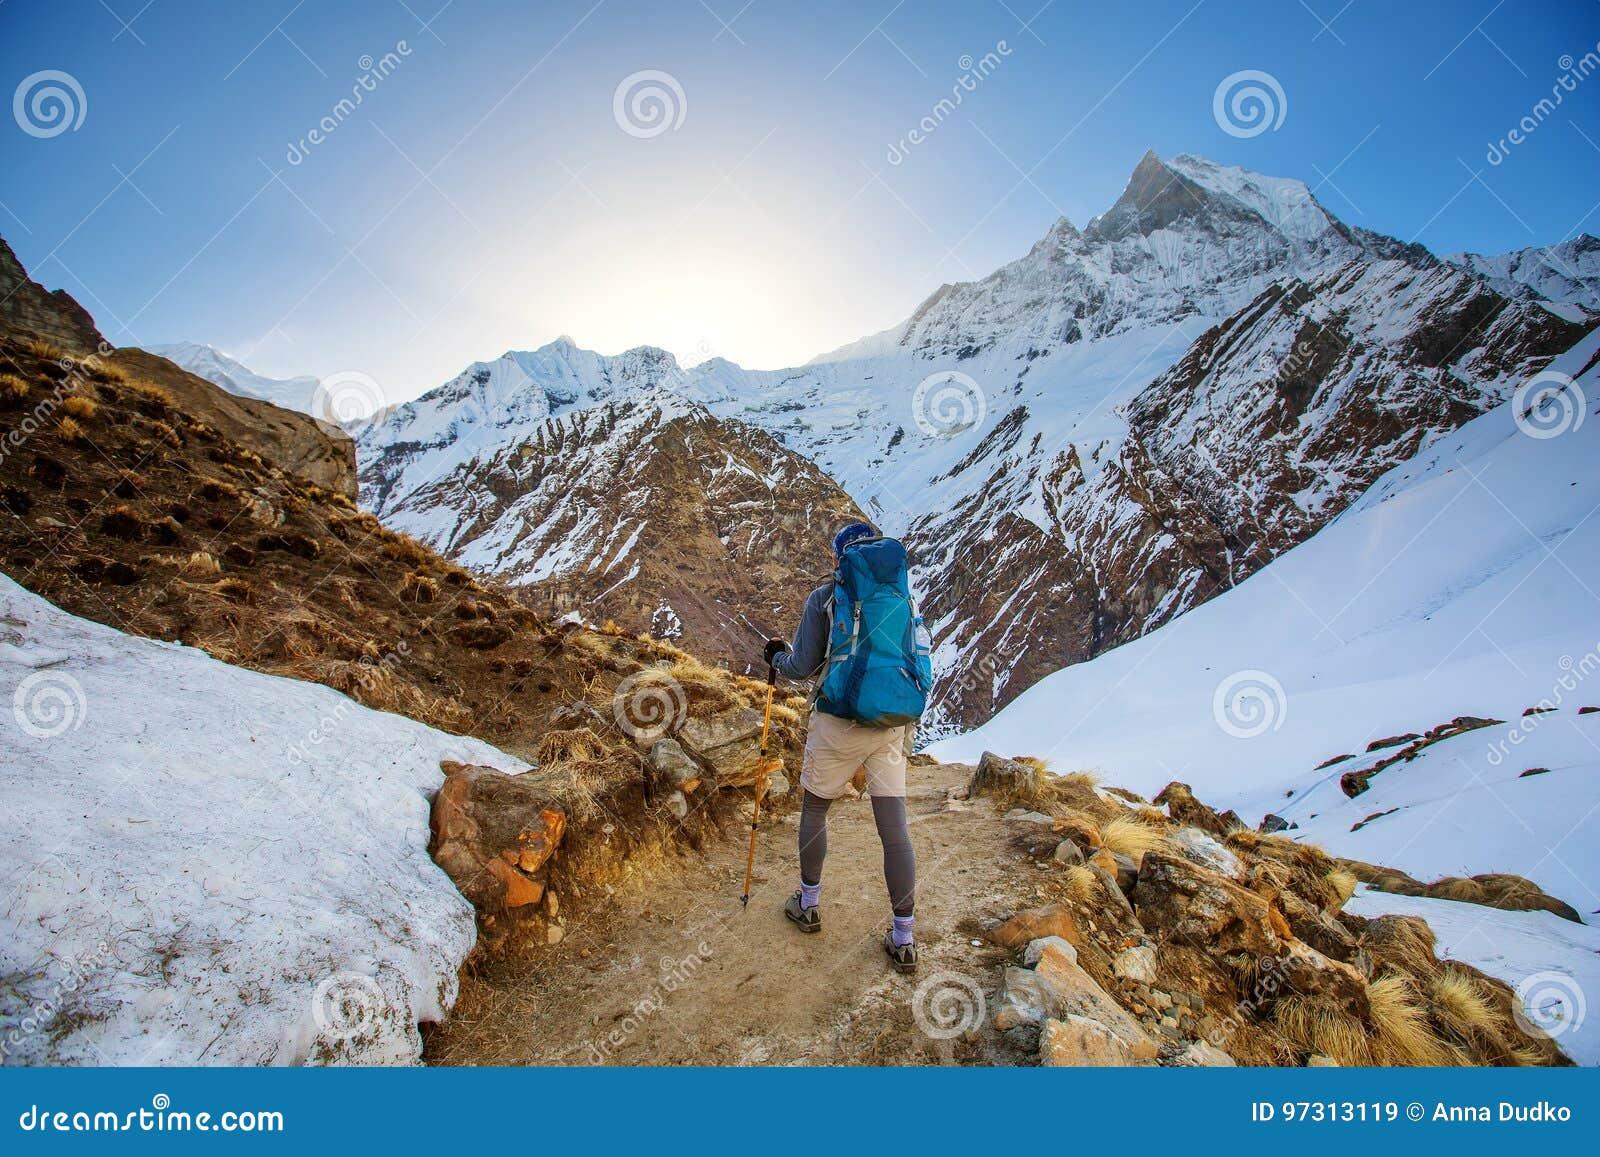 Hiker on the trek in Himalayas, Annapurna valley